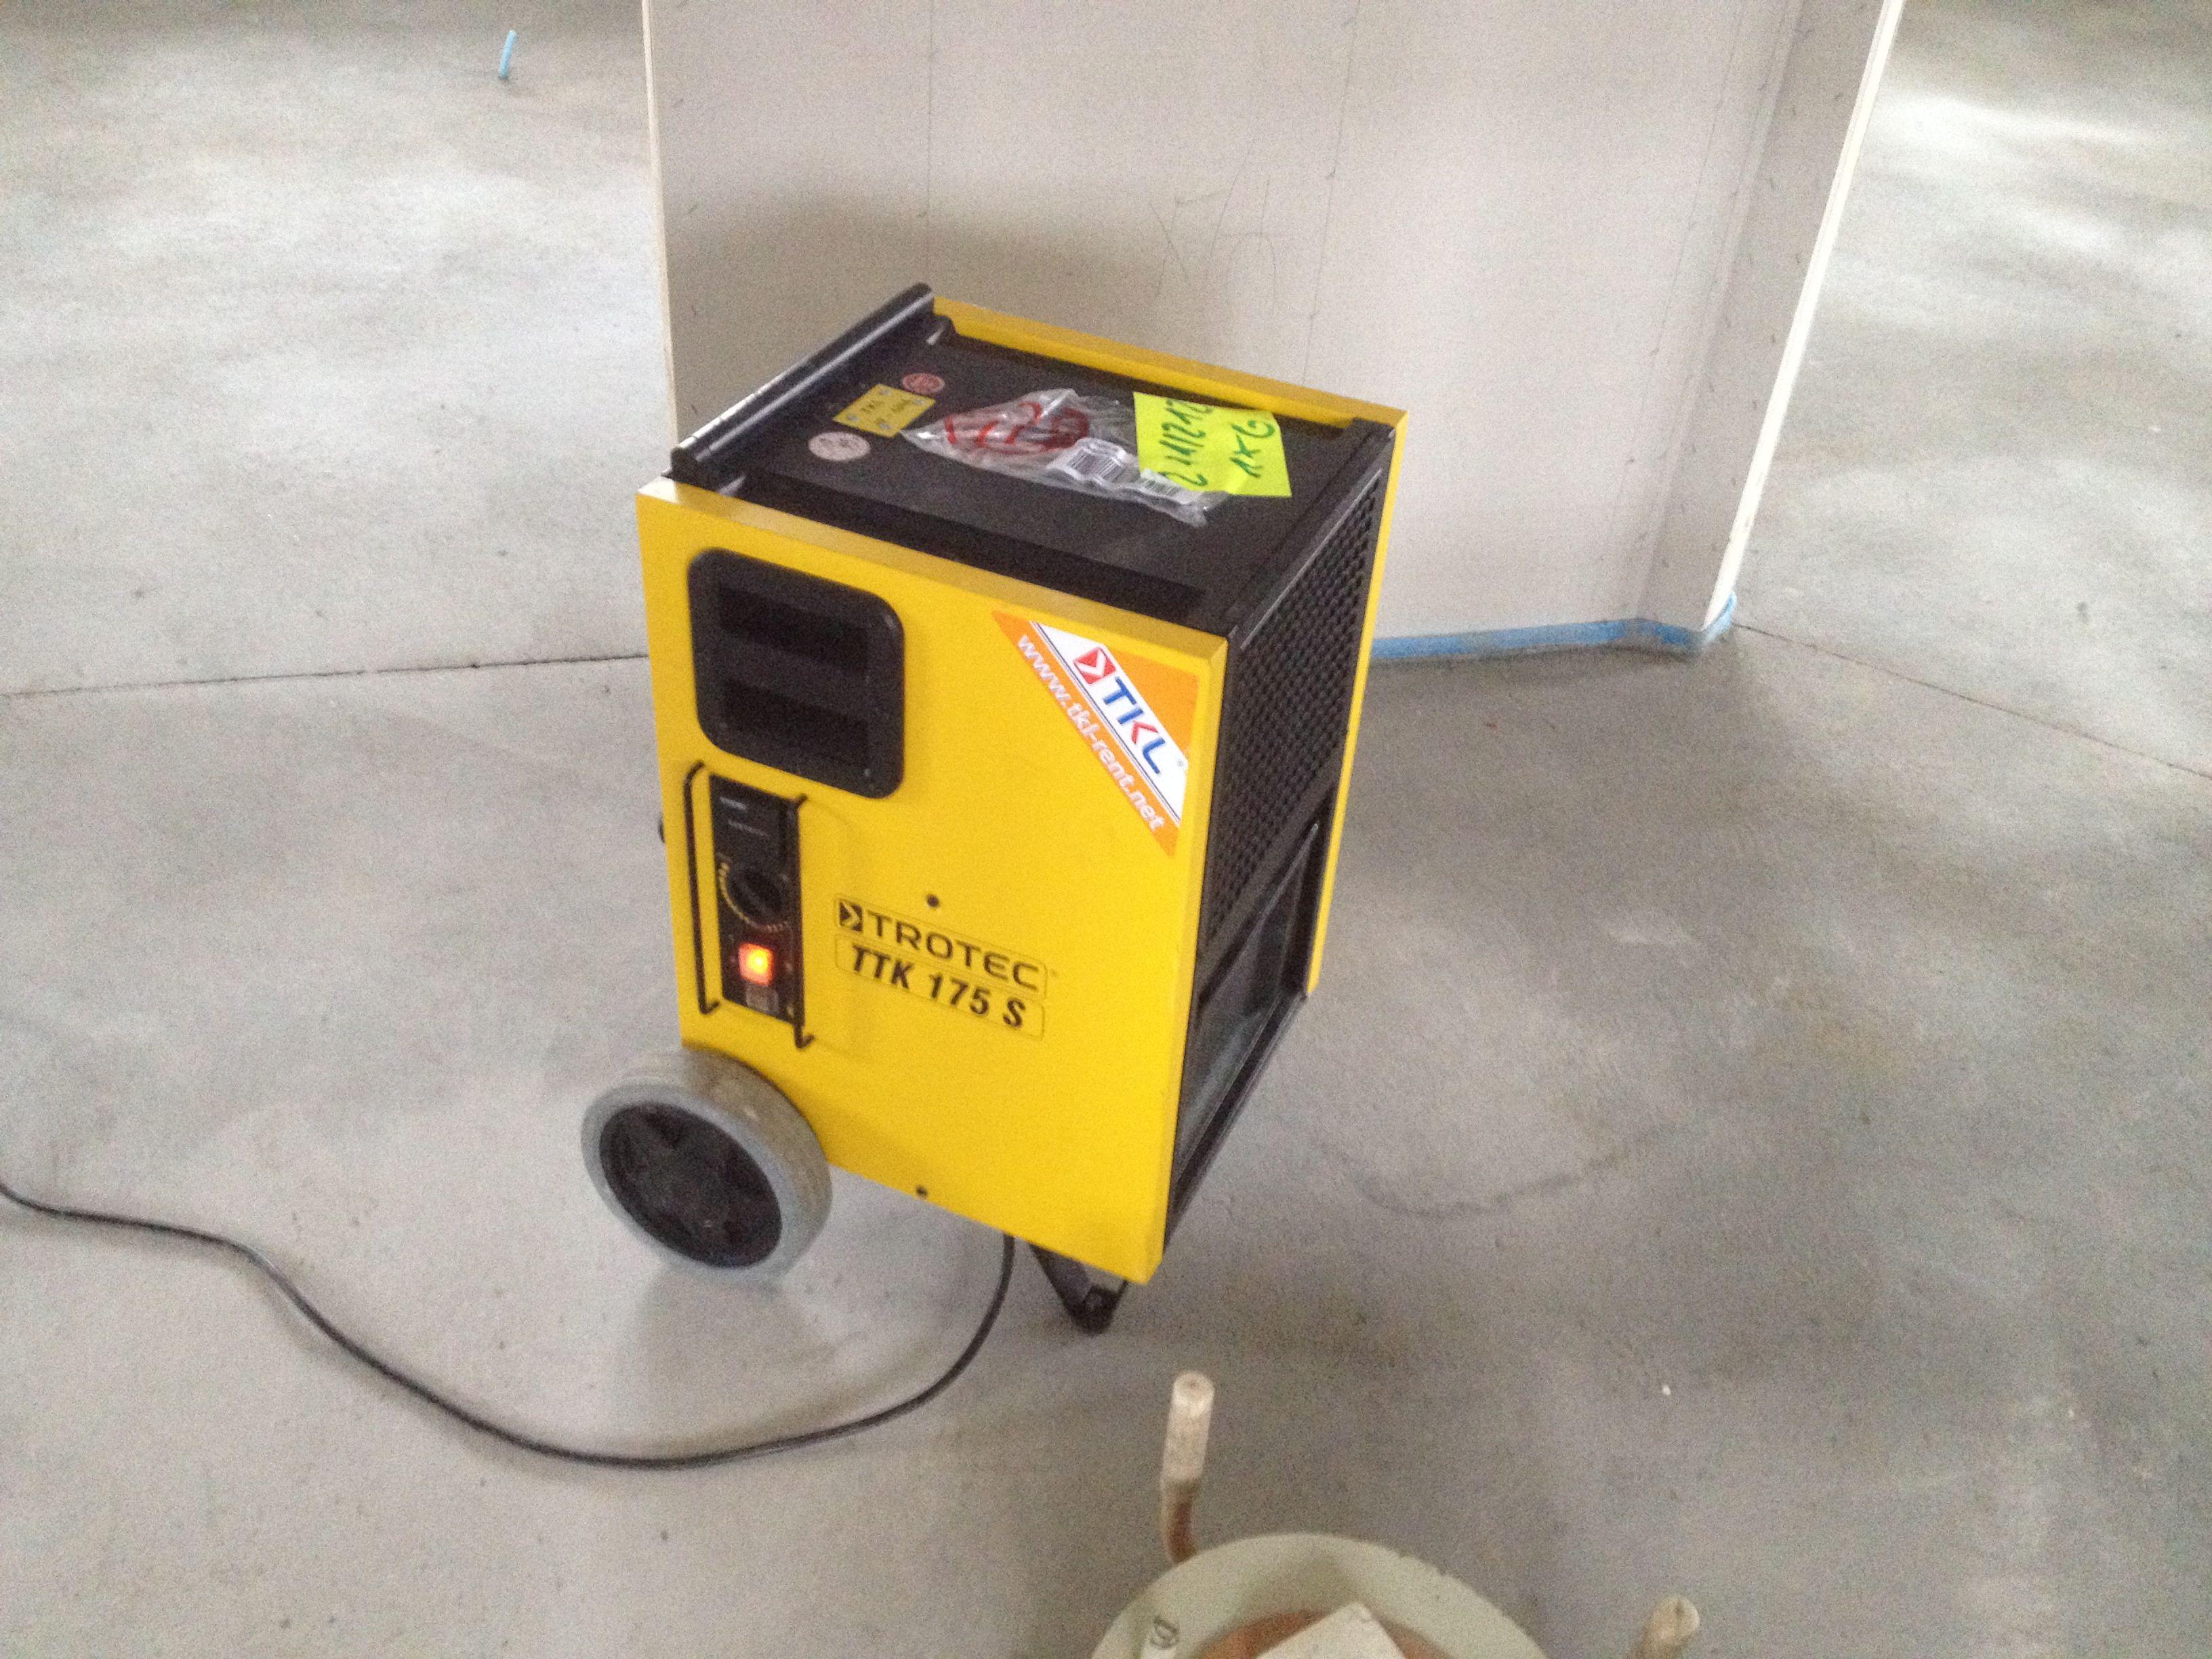 Kondenstrockner billig kondenstrockner billig kondenstrockner